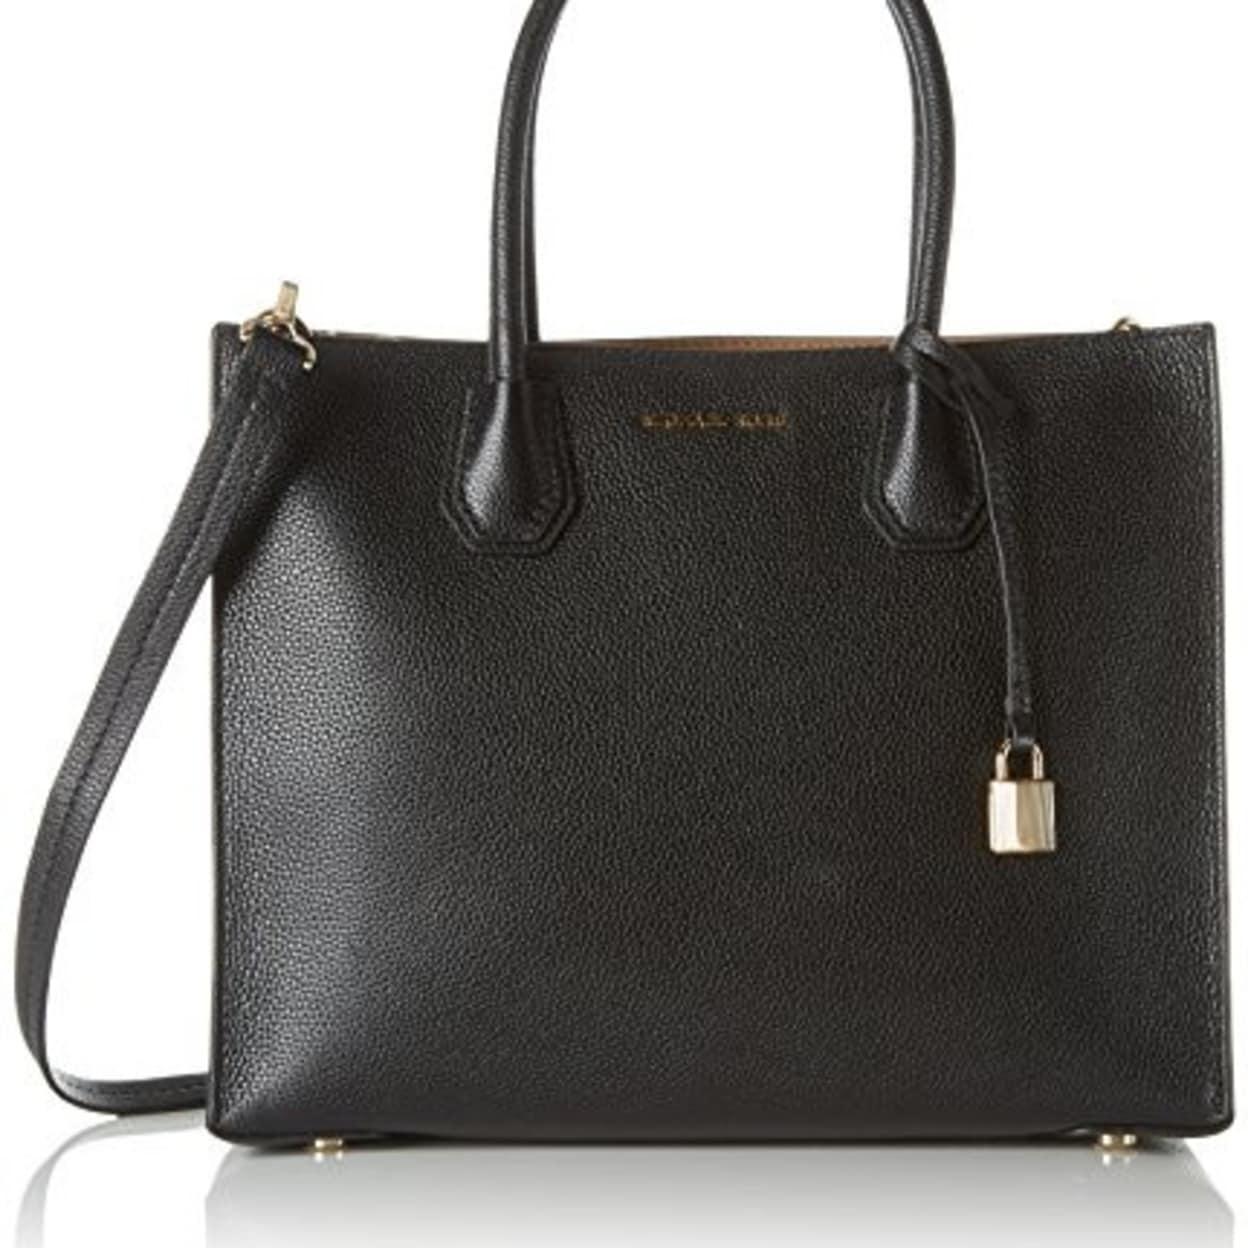 40ed4cf6930e8d MICHAEL Michael Kors Handbags | Shop our Best Clothing & Shoes Deals Online  at Overstock